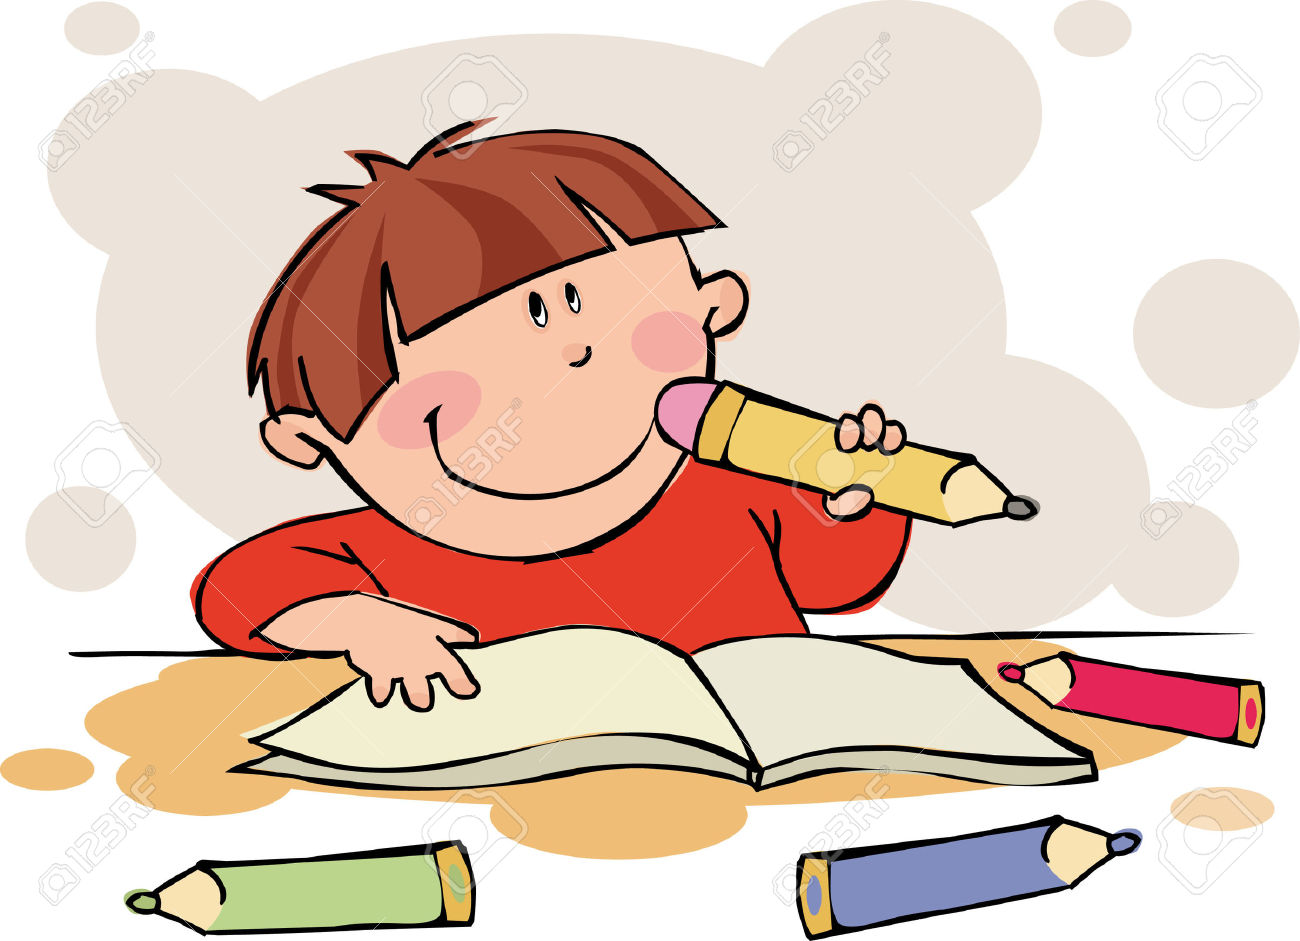 Primary School Grinds Kildare